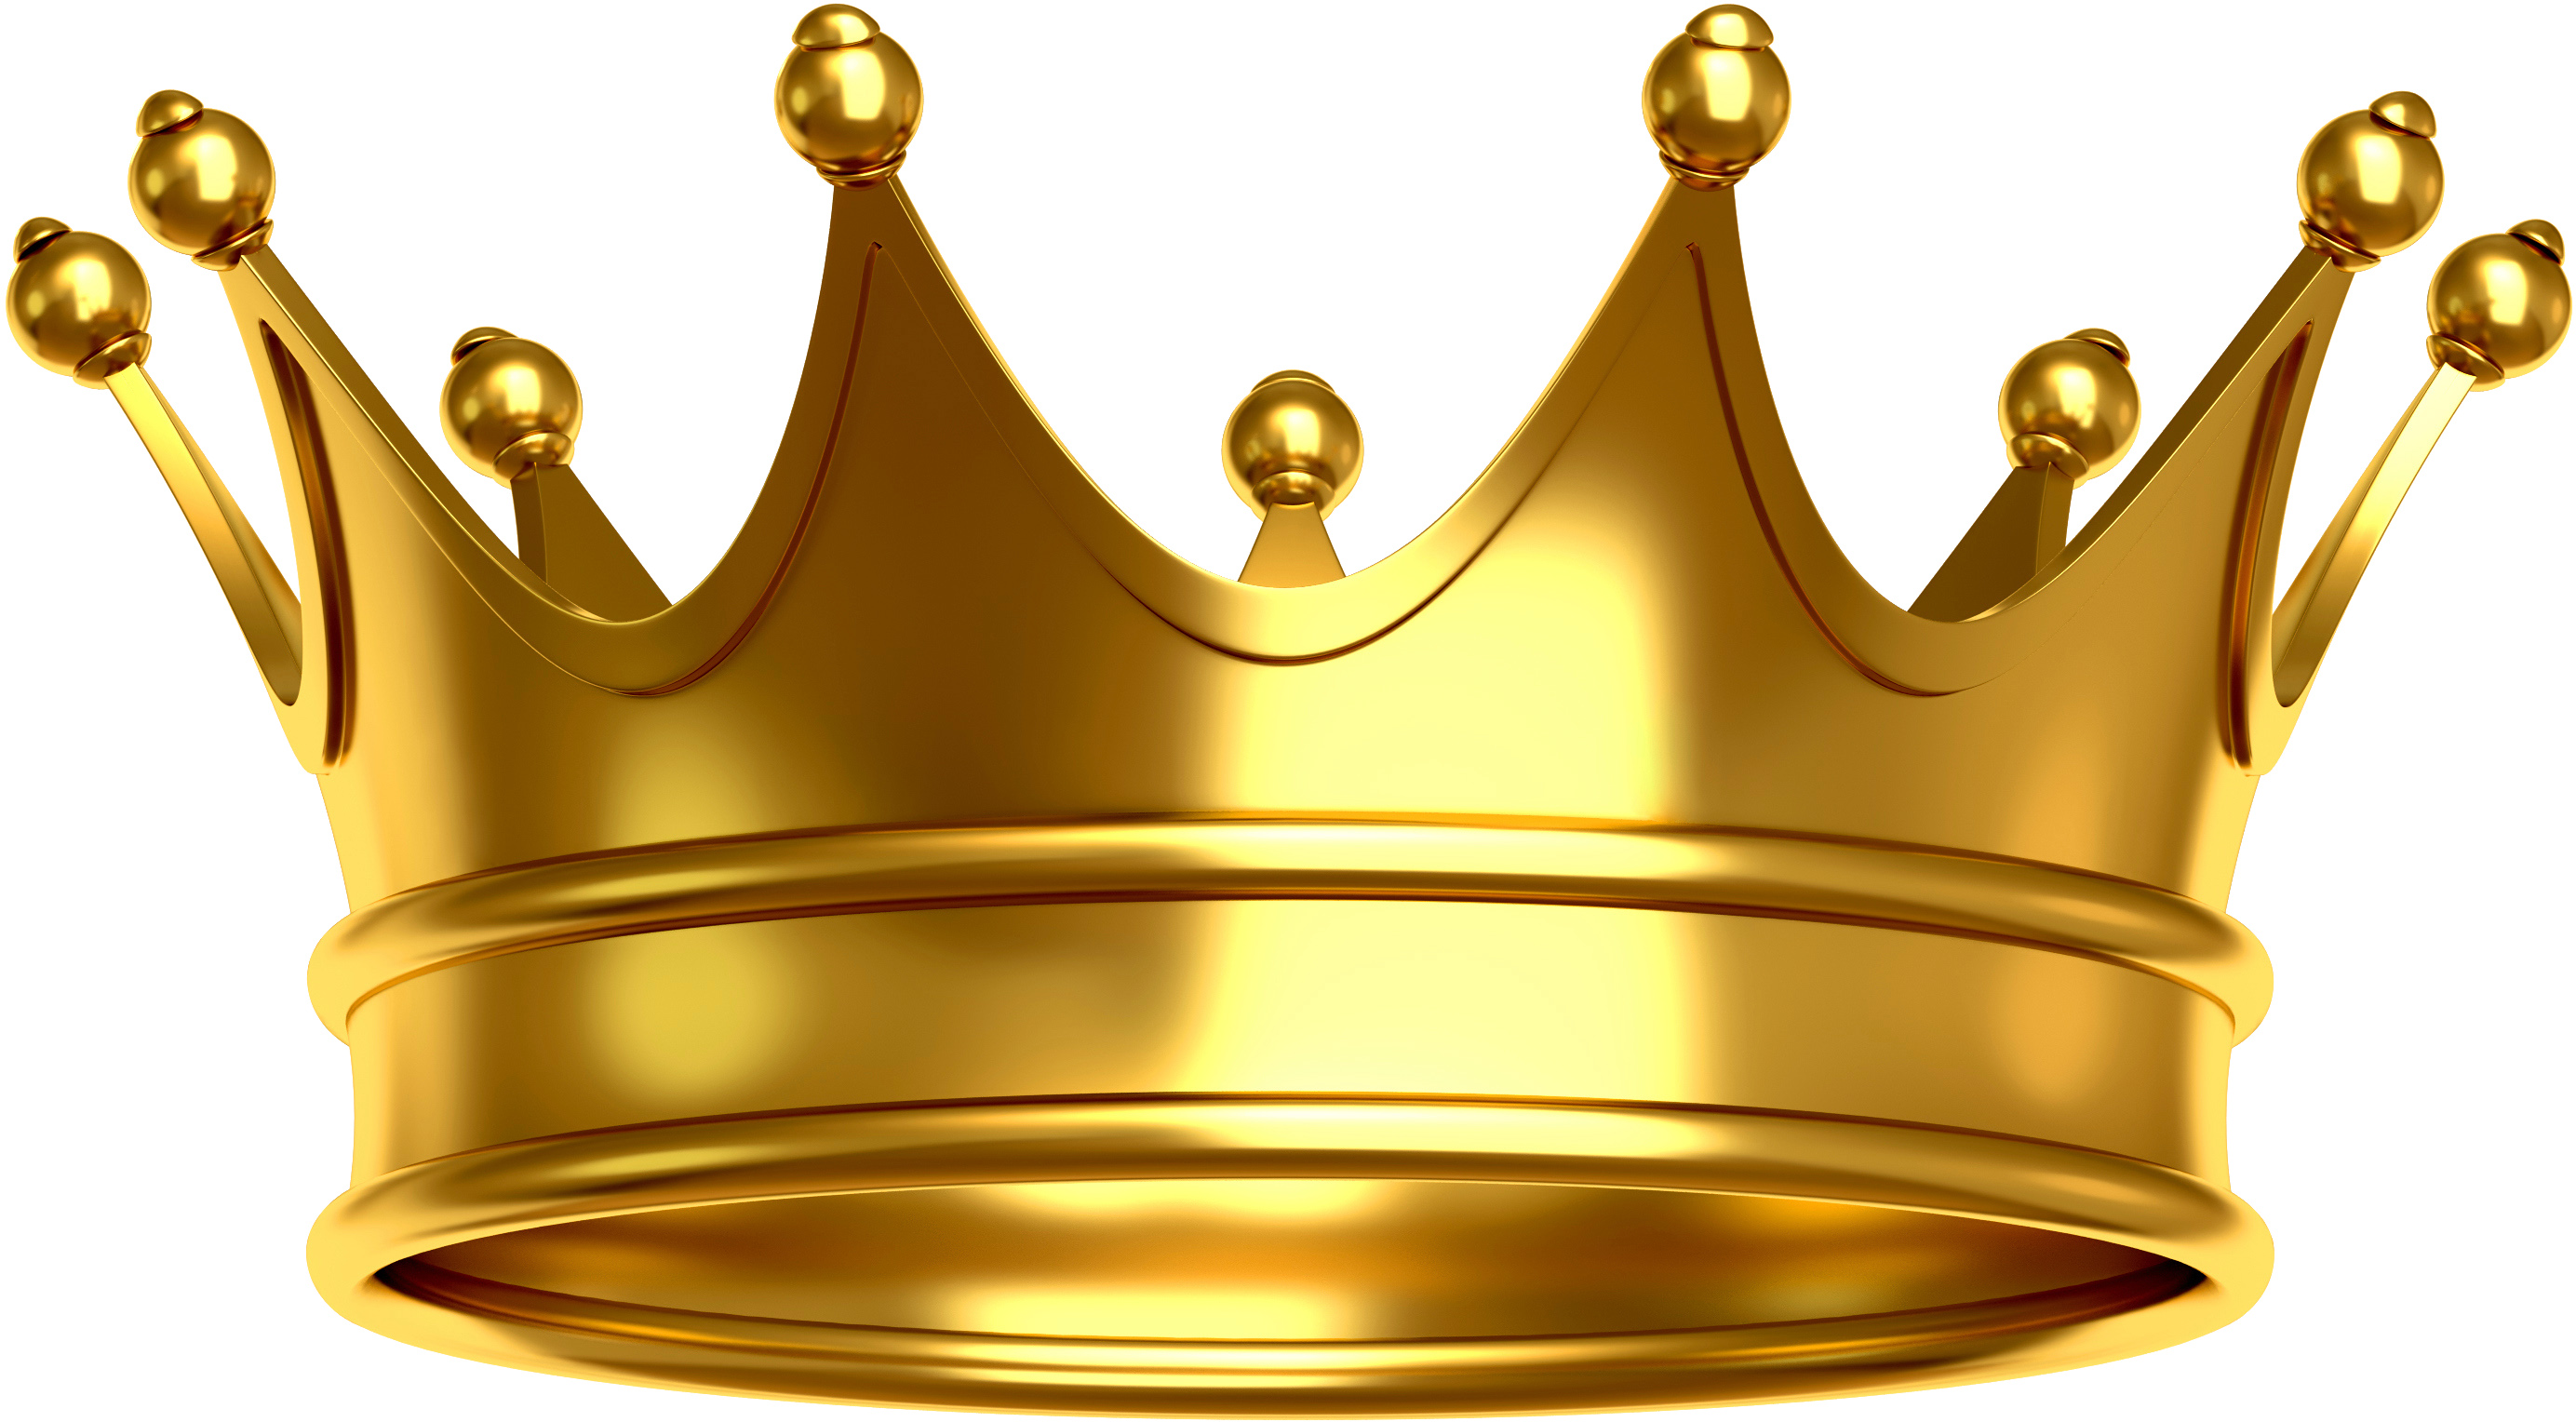 Crown | Free Im...